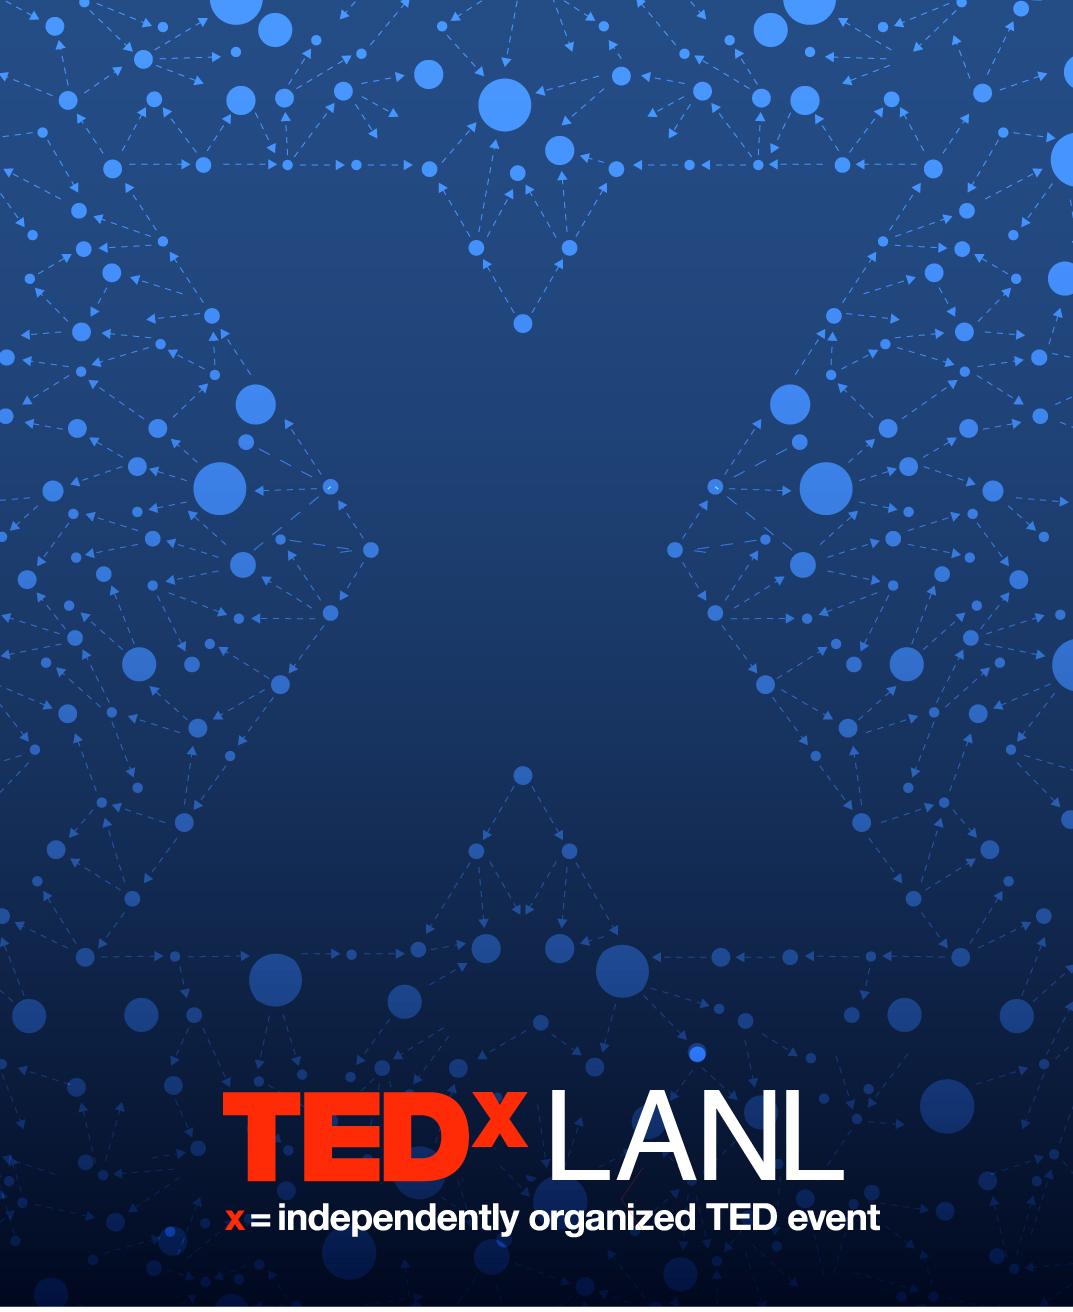 TedX_Marketing-02.jpg